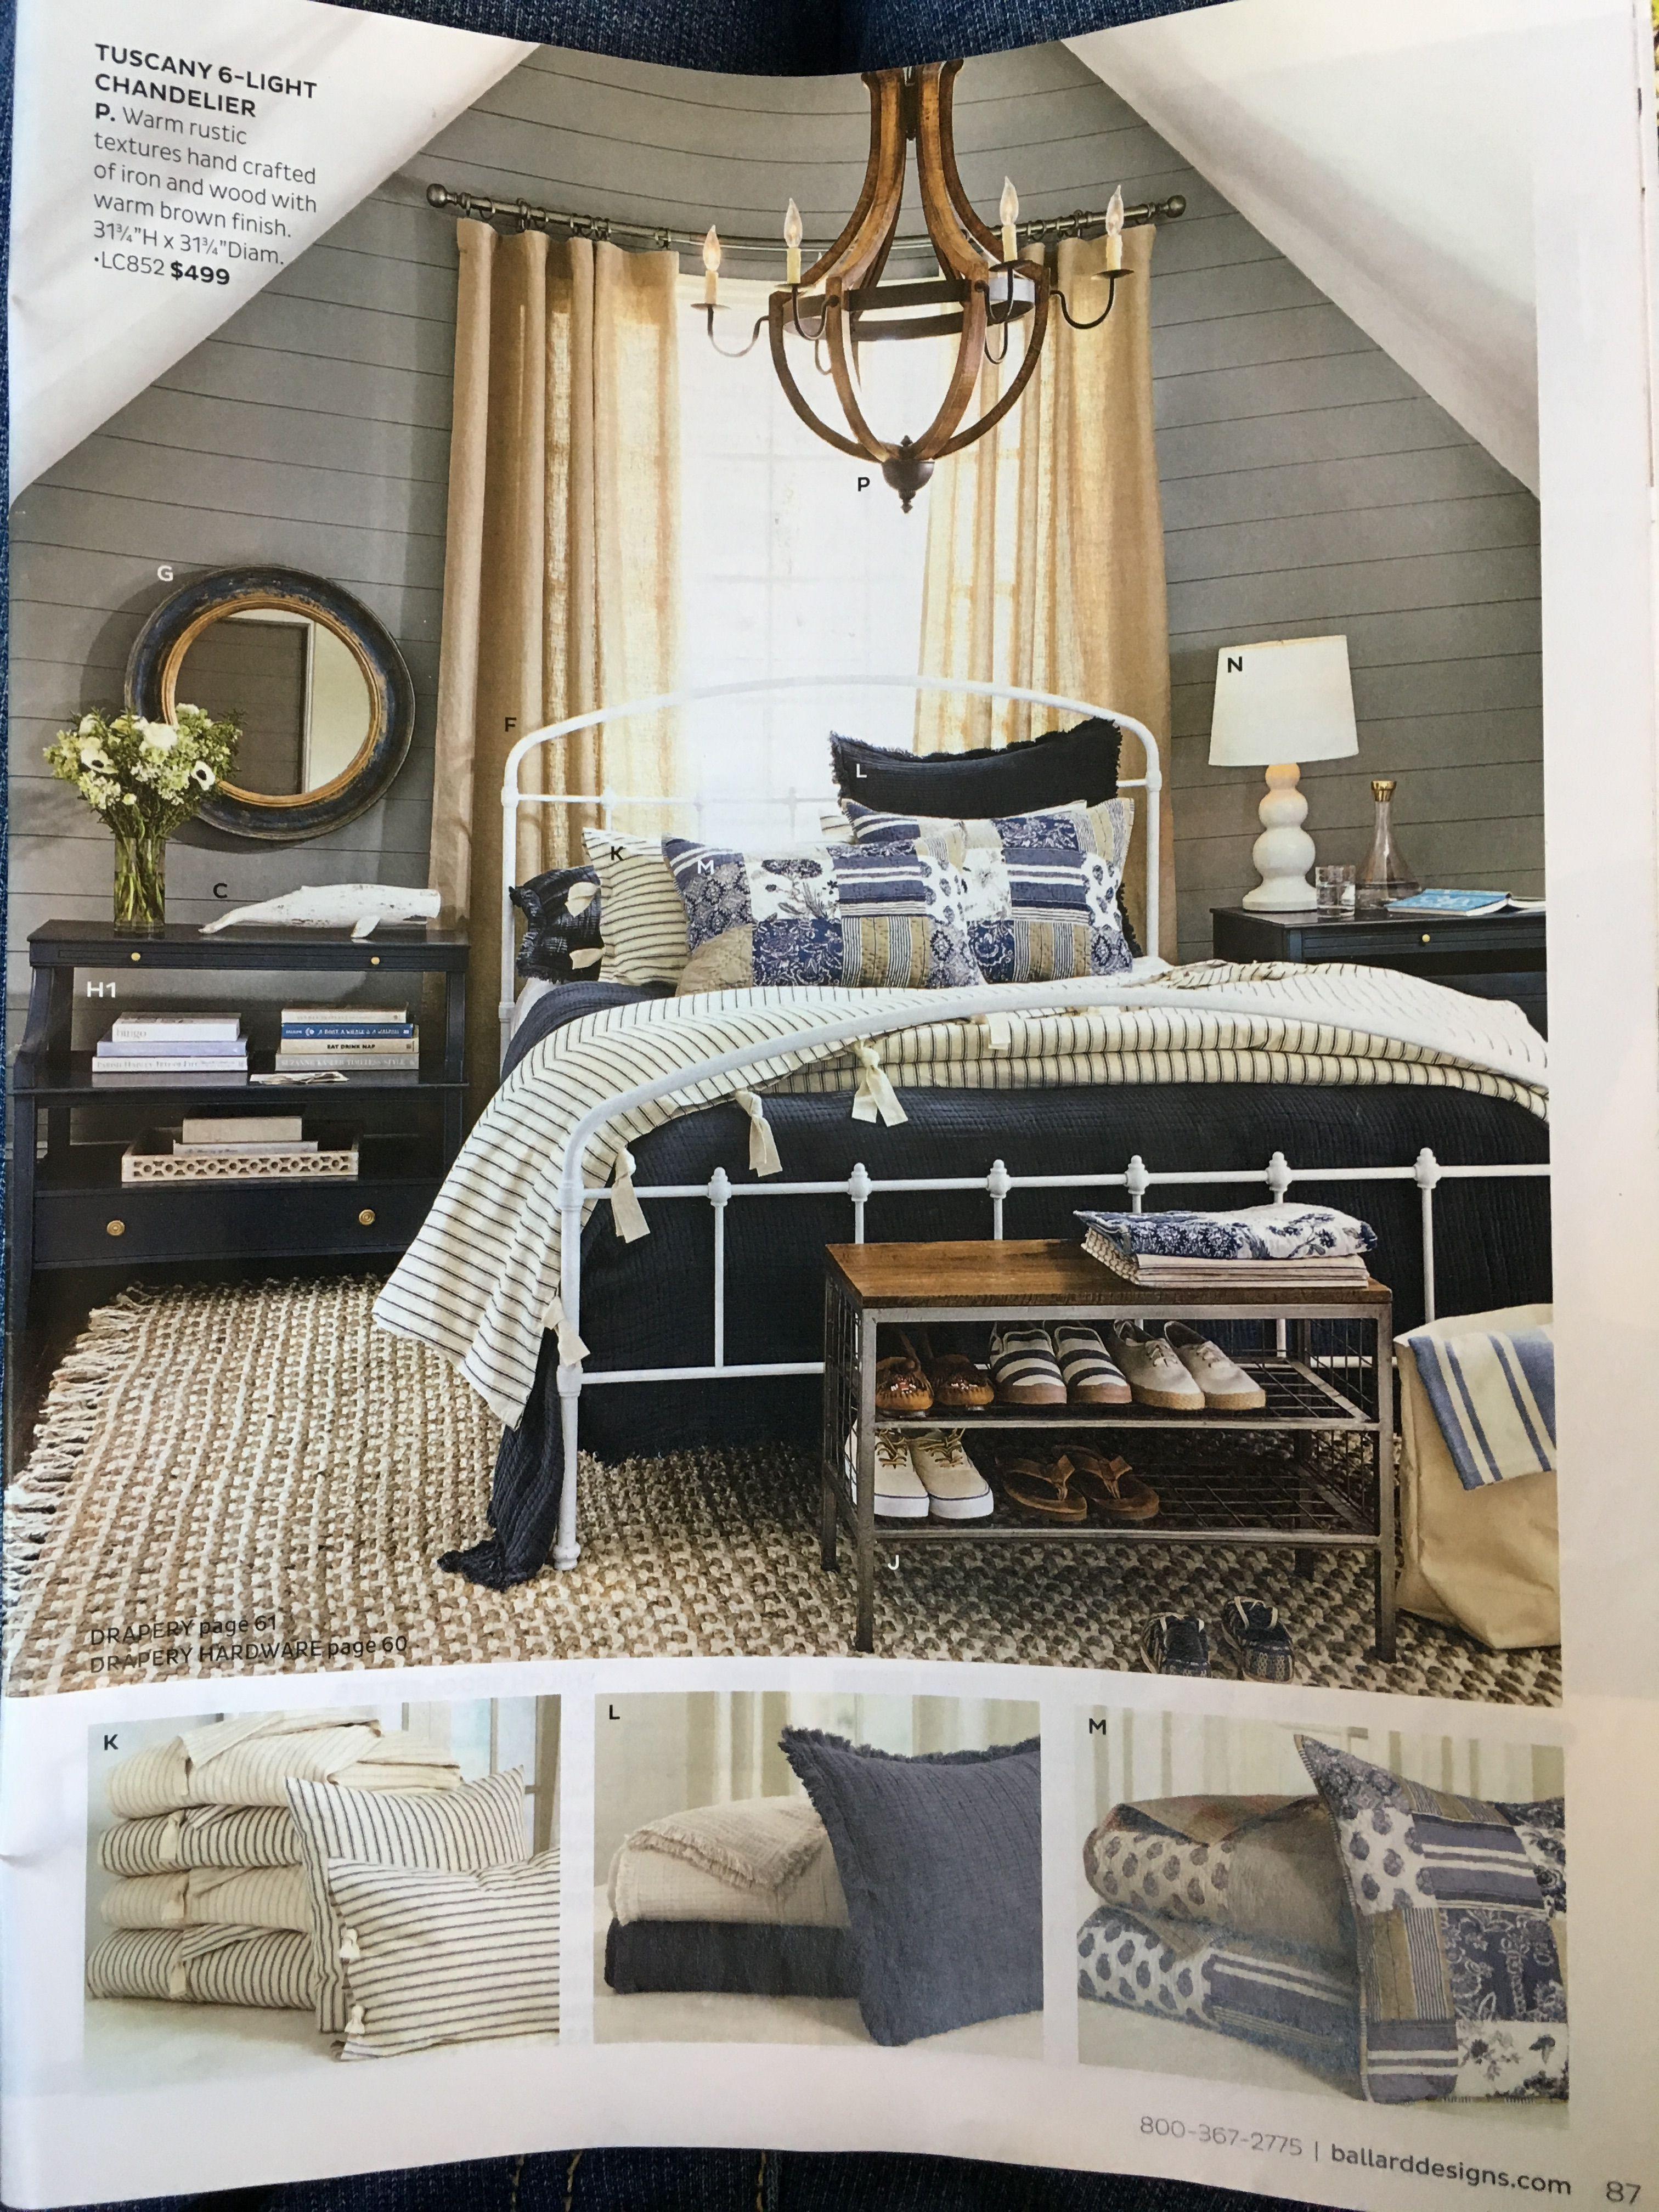 Cool loft | Home decor, Navy blue bedrooms, Home